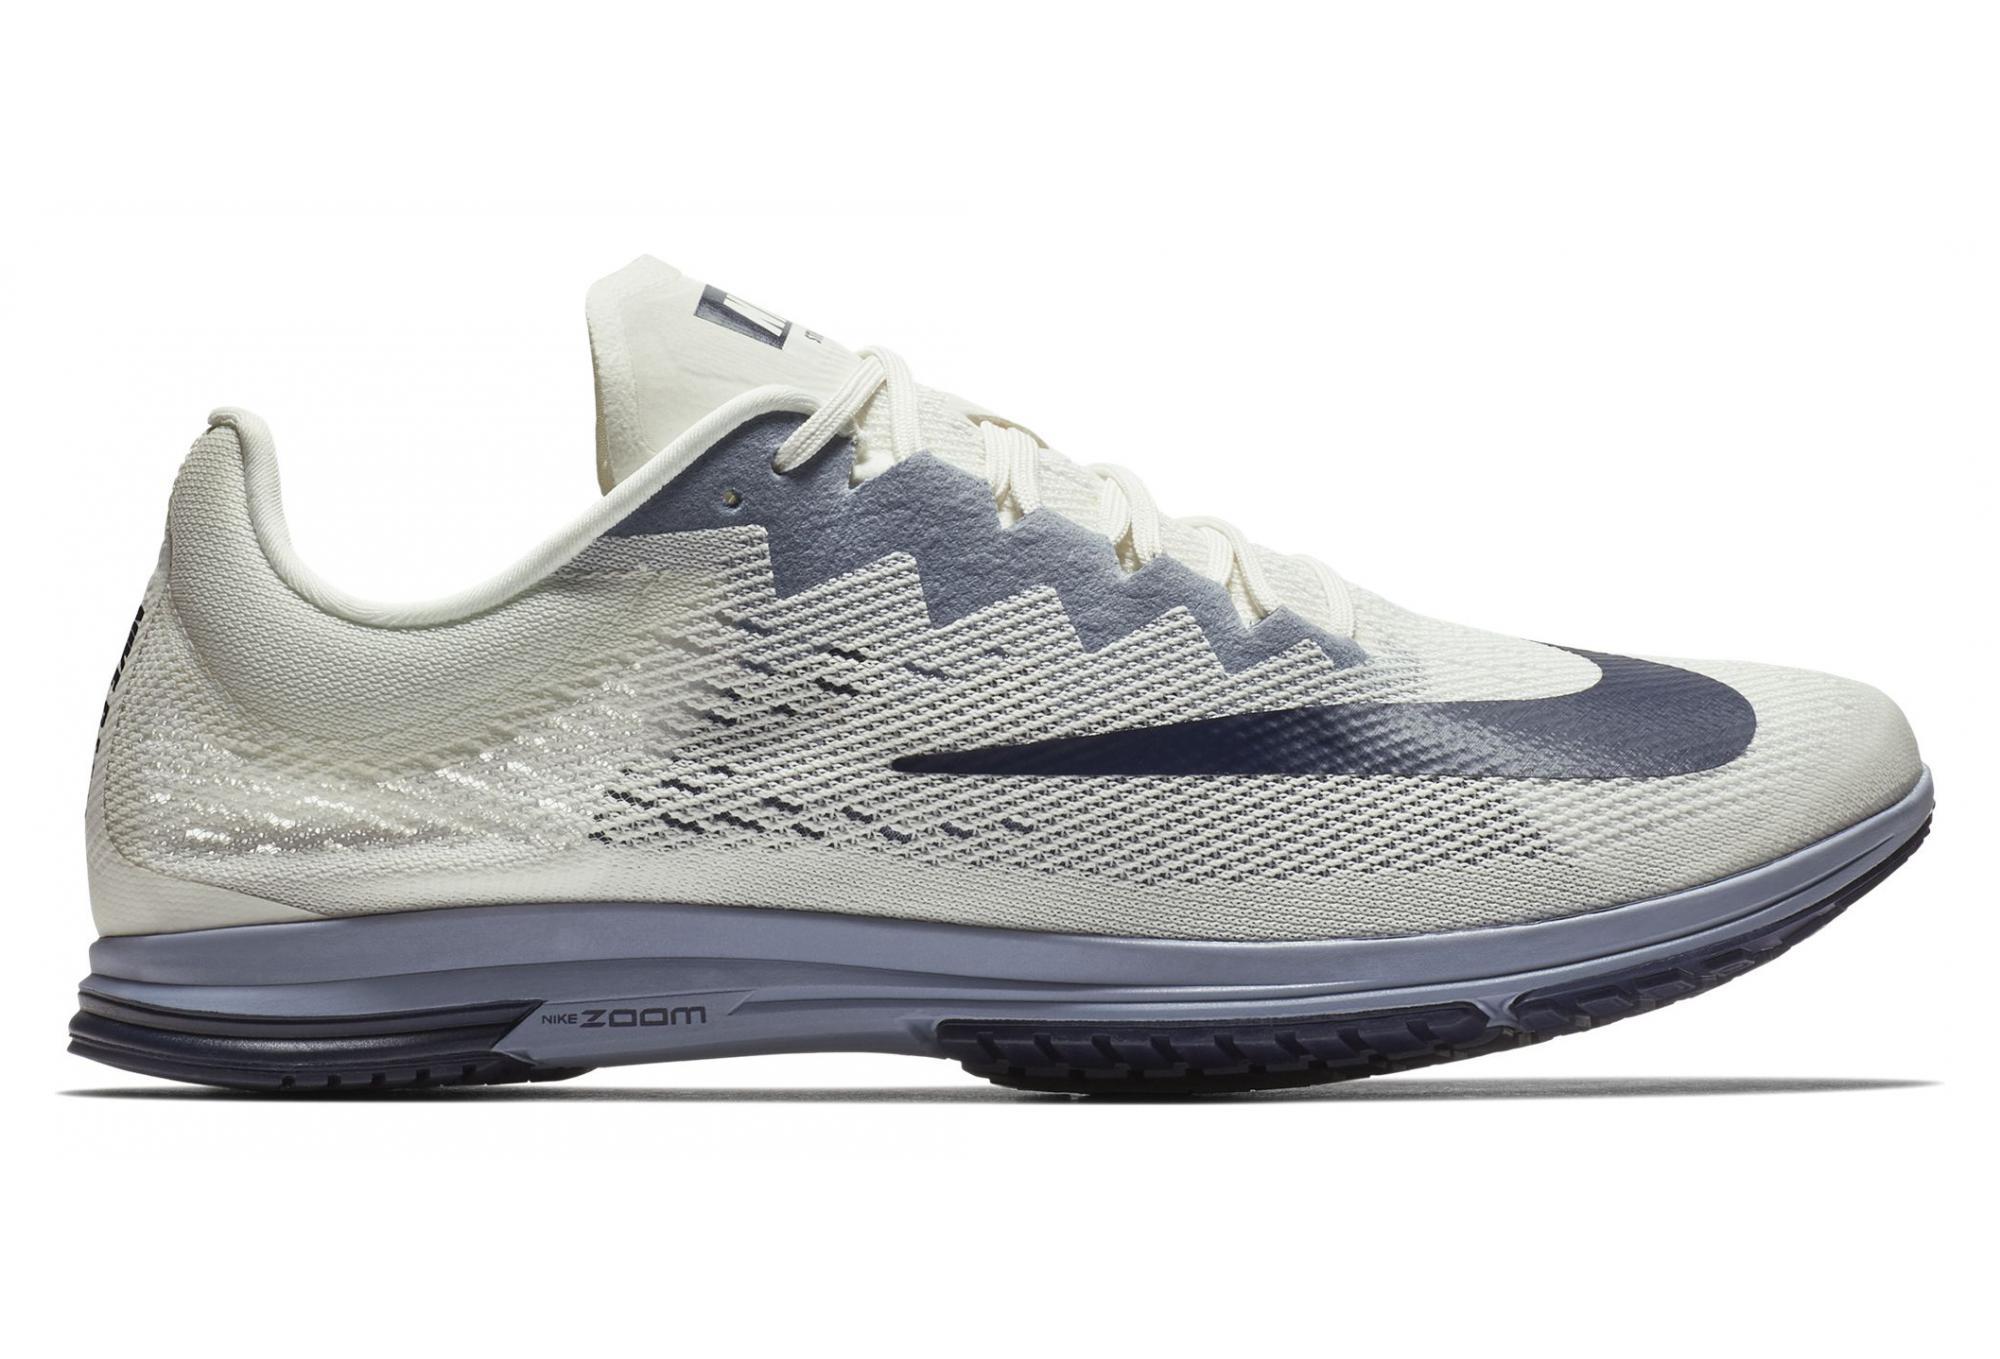 3c9de17a4b53 Nike Shoes Zoom Streak LT 4 White Blue Unisex